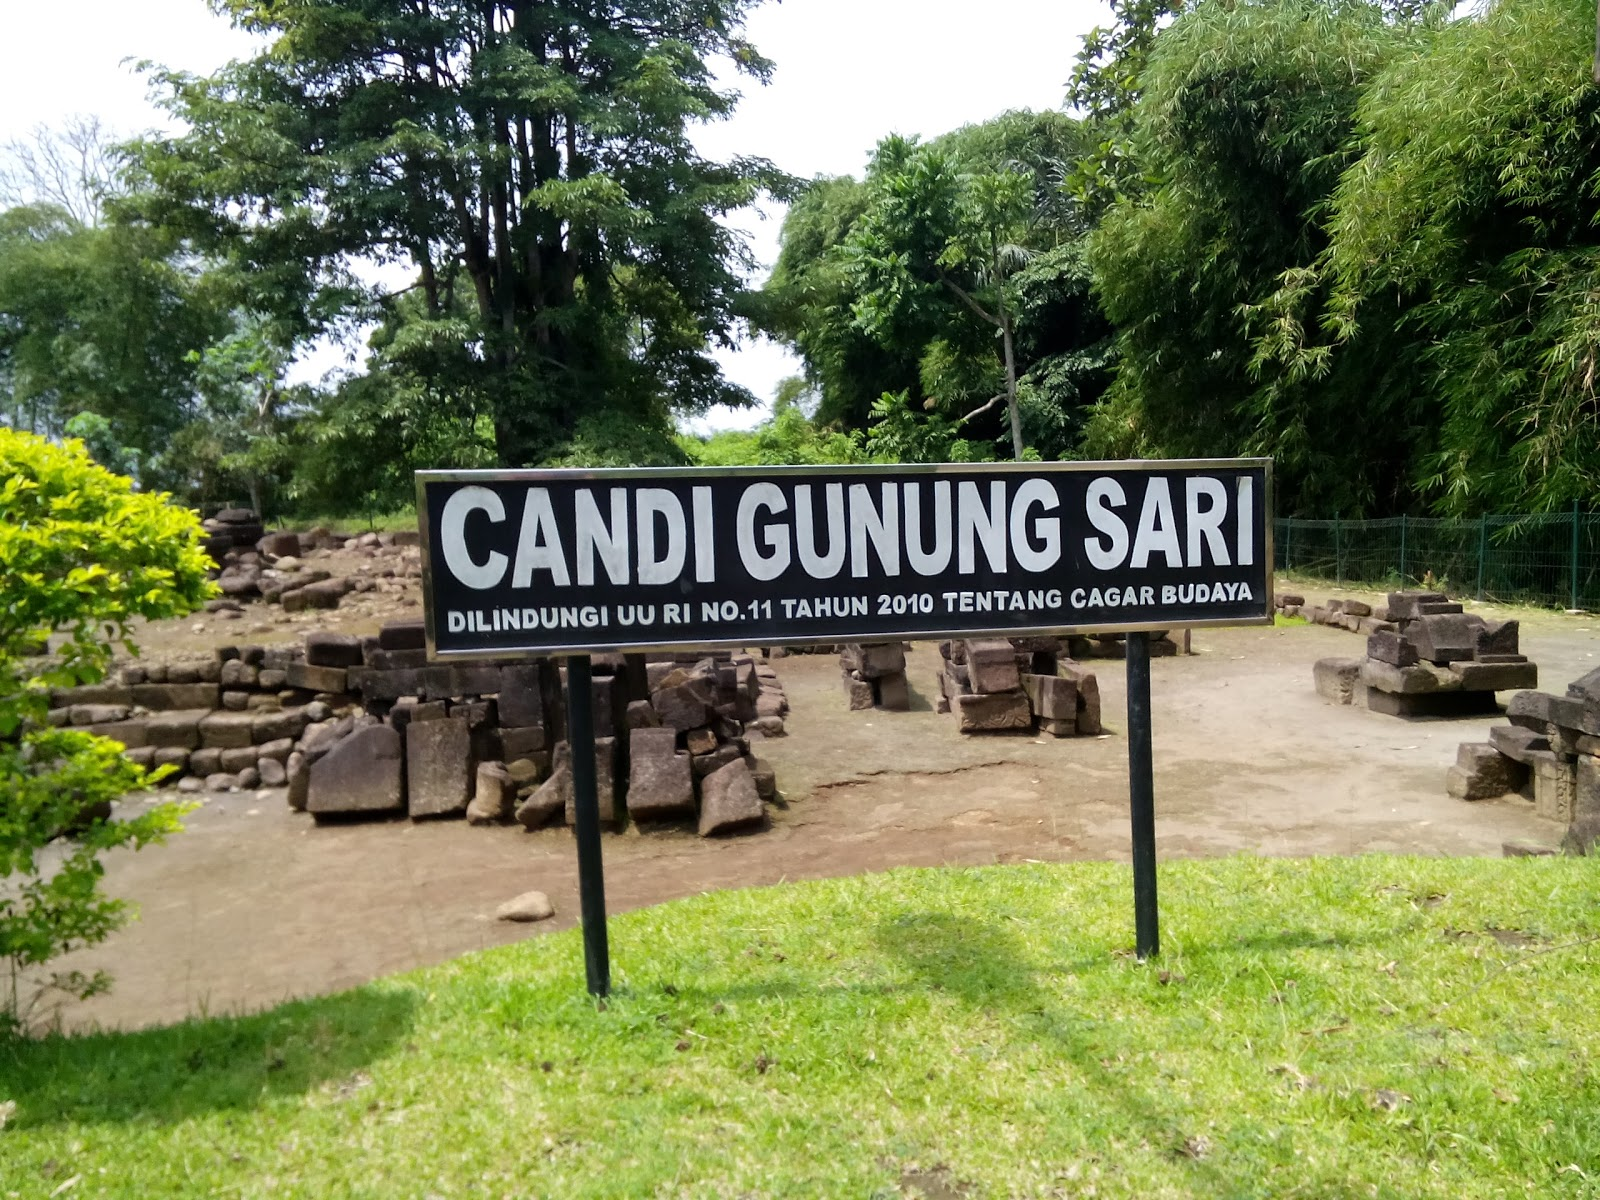 Kompleks Candi Gunungsari Magelang Jawa Tengah Gunung Sari Kab